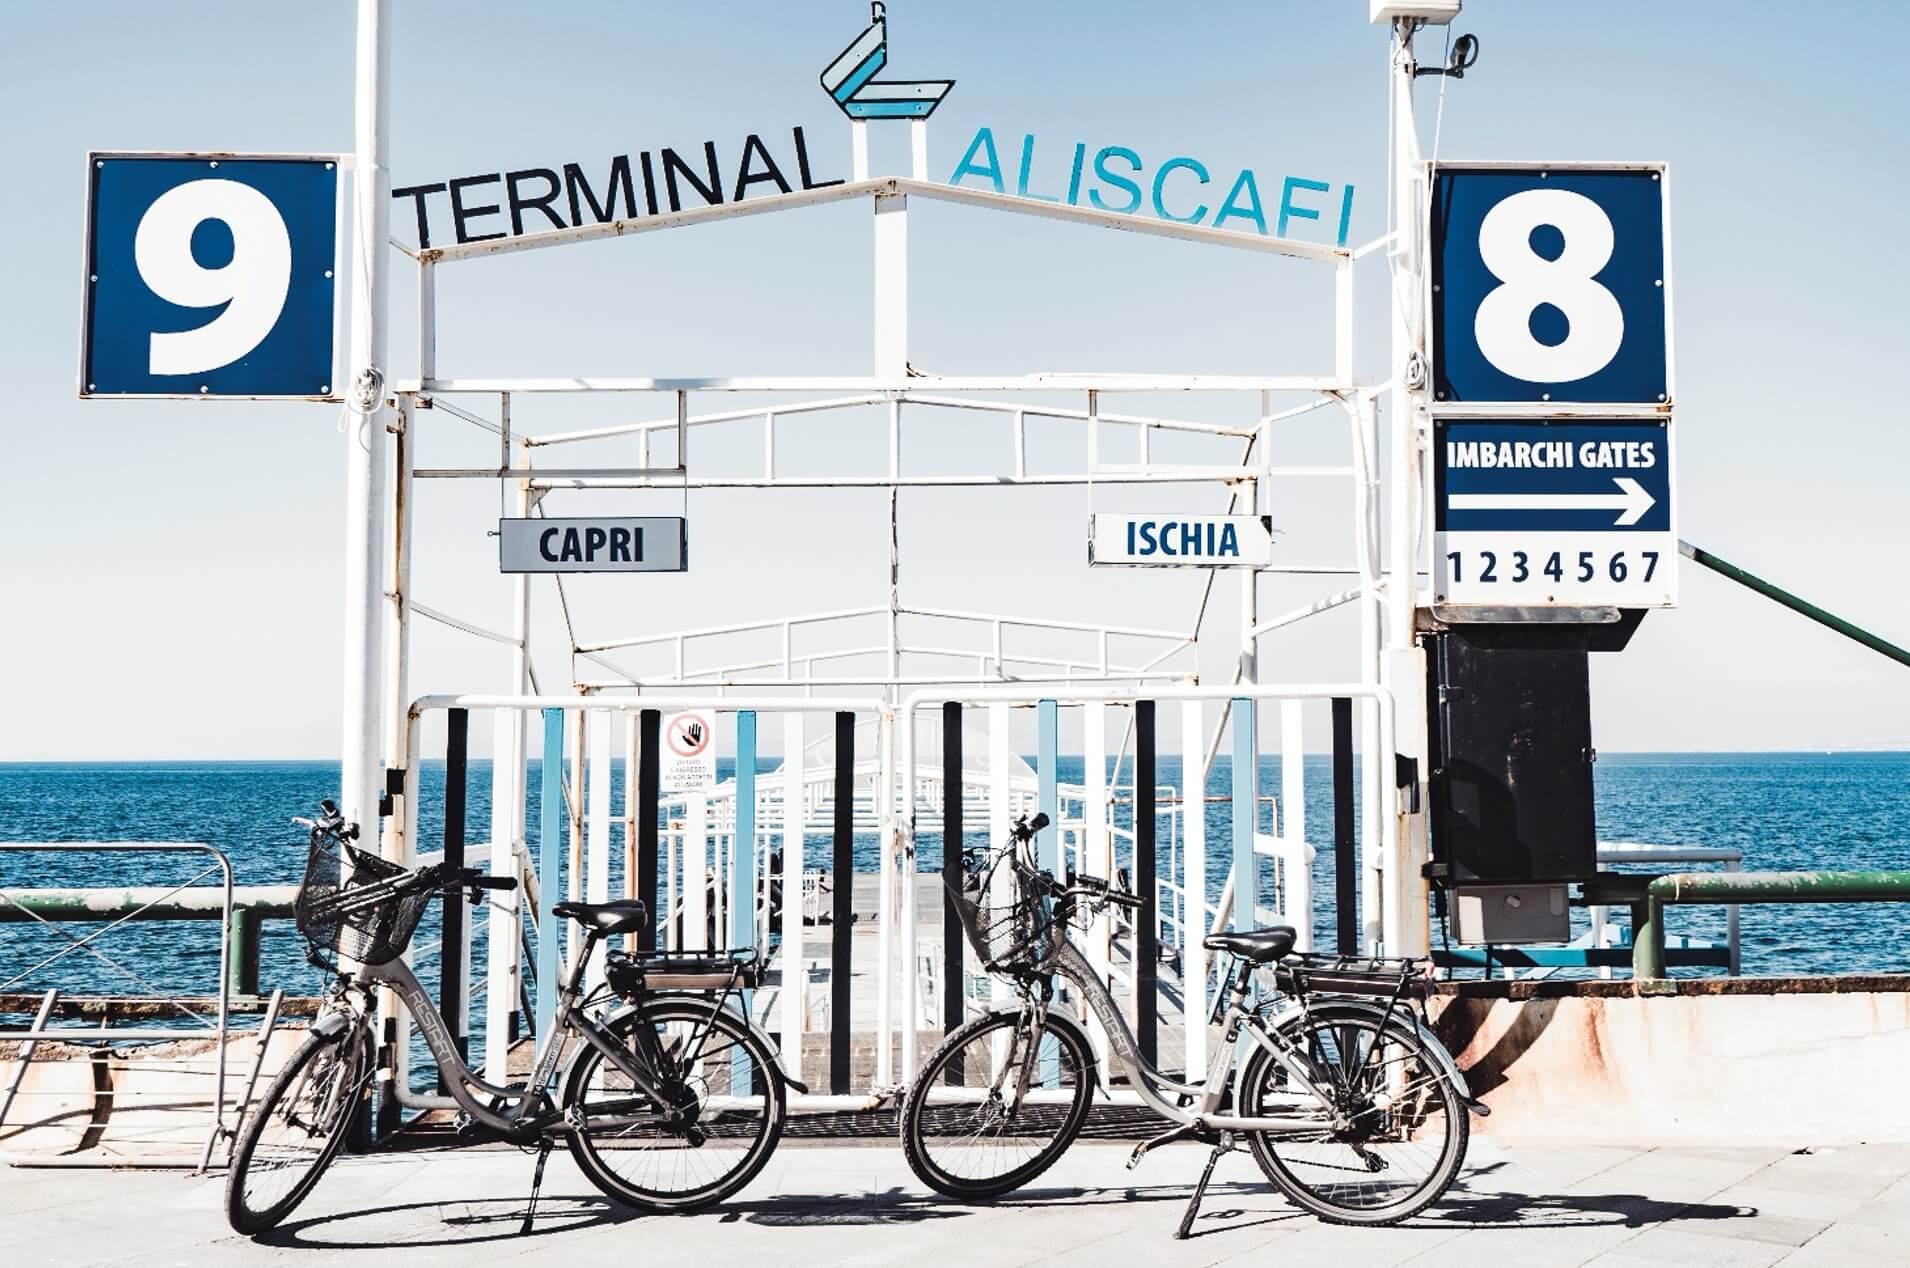 Why should you visit the Amalfi Coast by bike